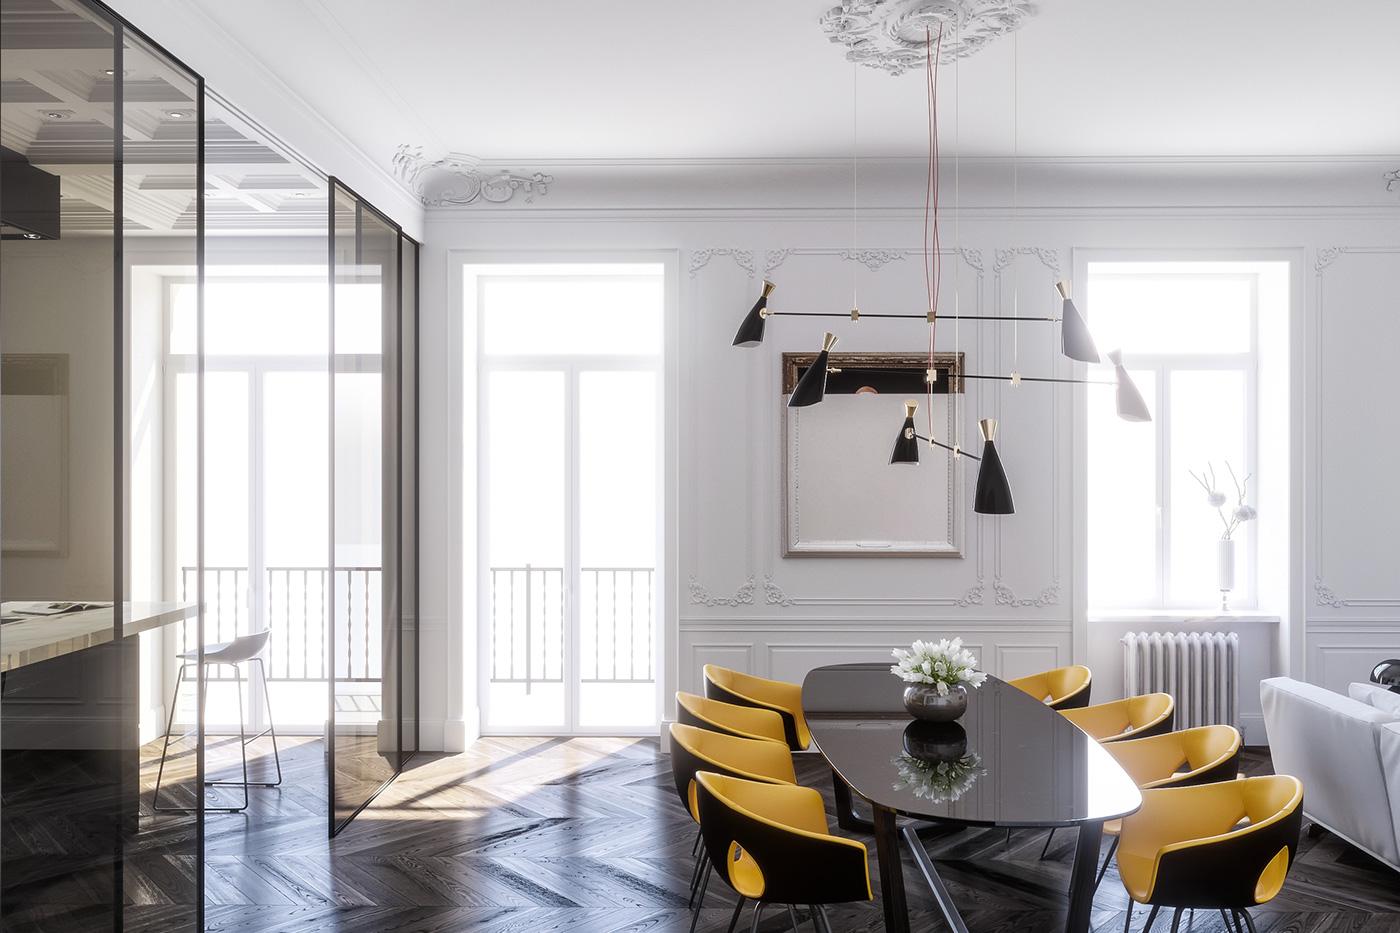 Modern interior design for dining room